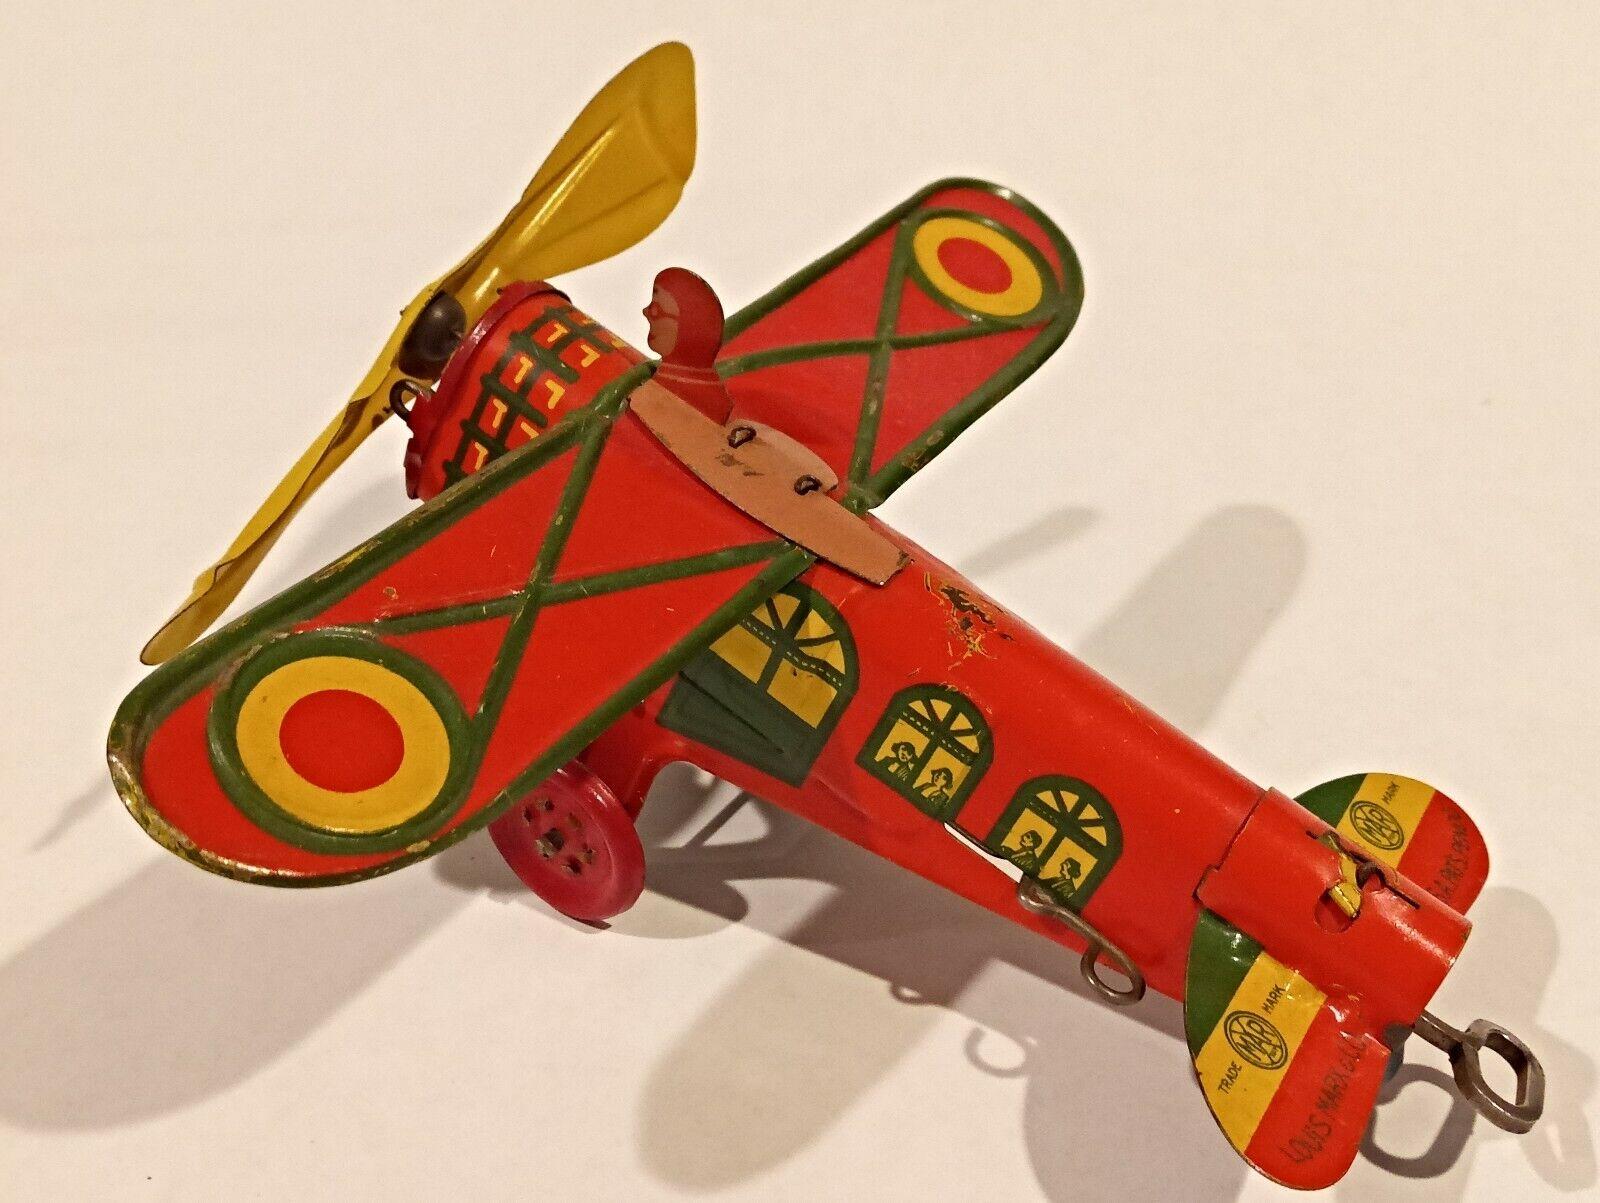 Marx, No. 700 Dare Devil Flyer Plane, 1928, EX Condition, Extremely Rare